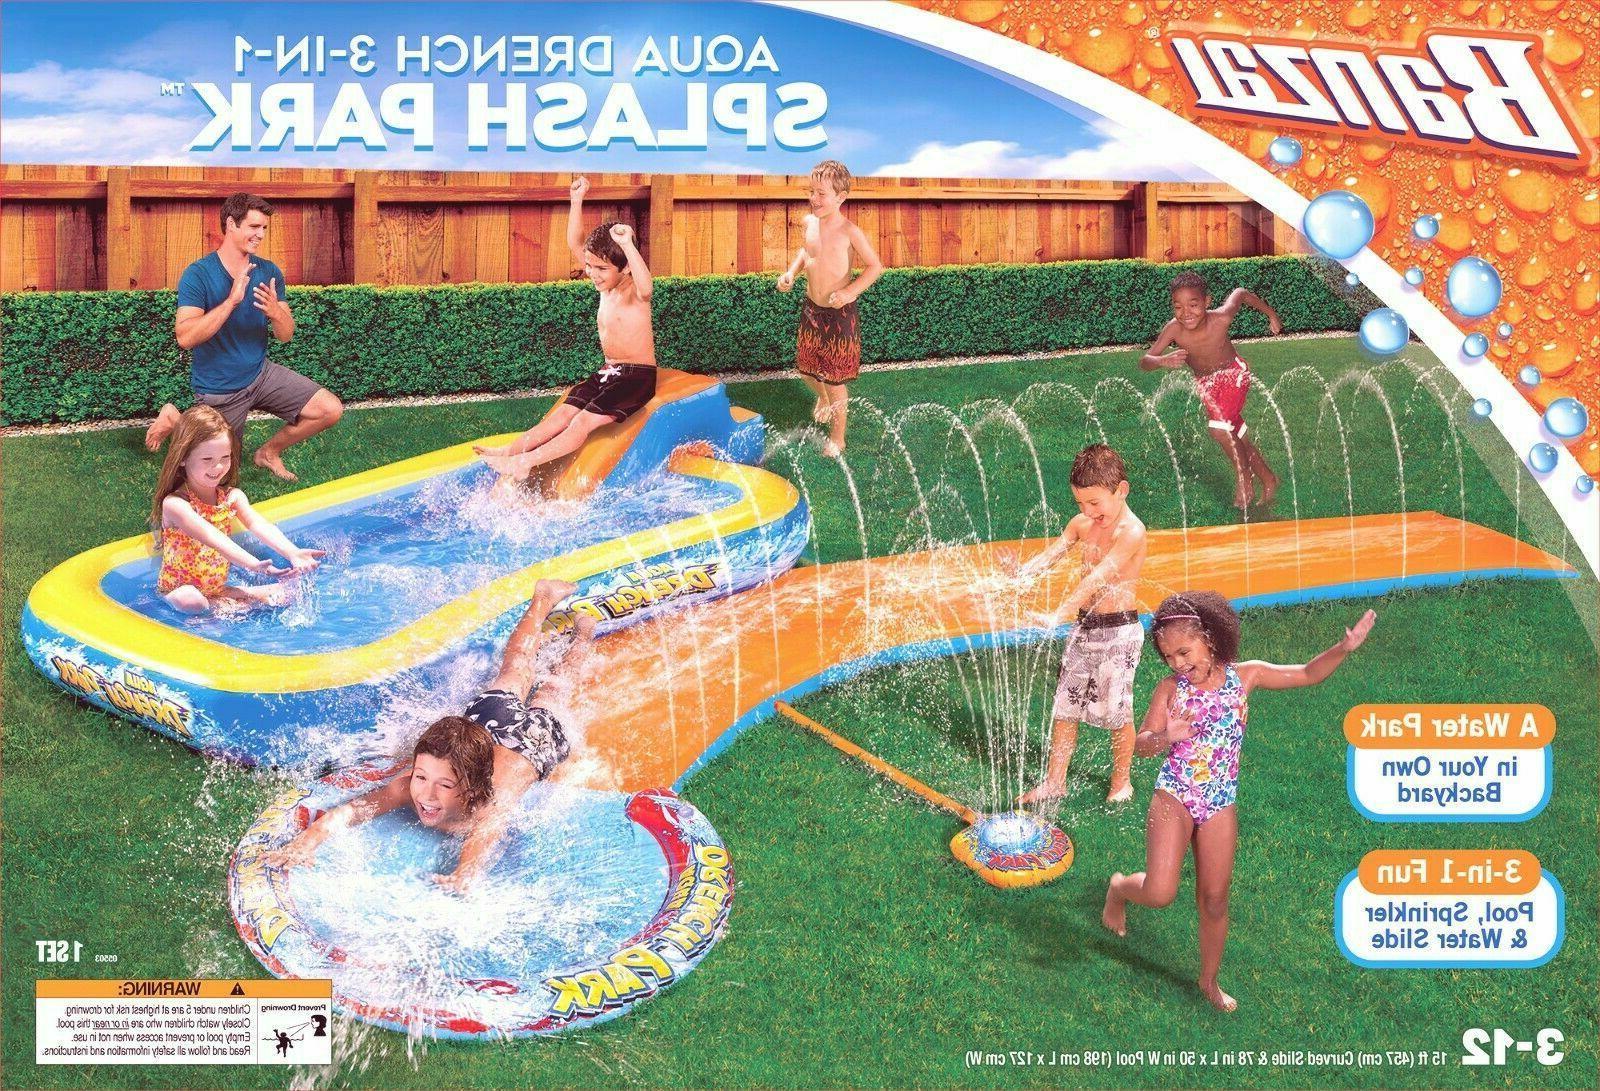 3 in 1 aqua water drench splash